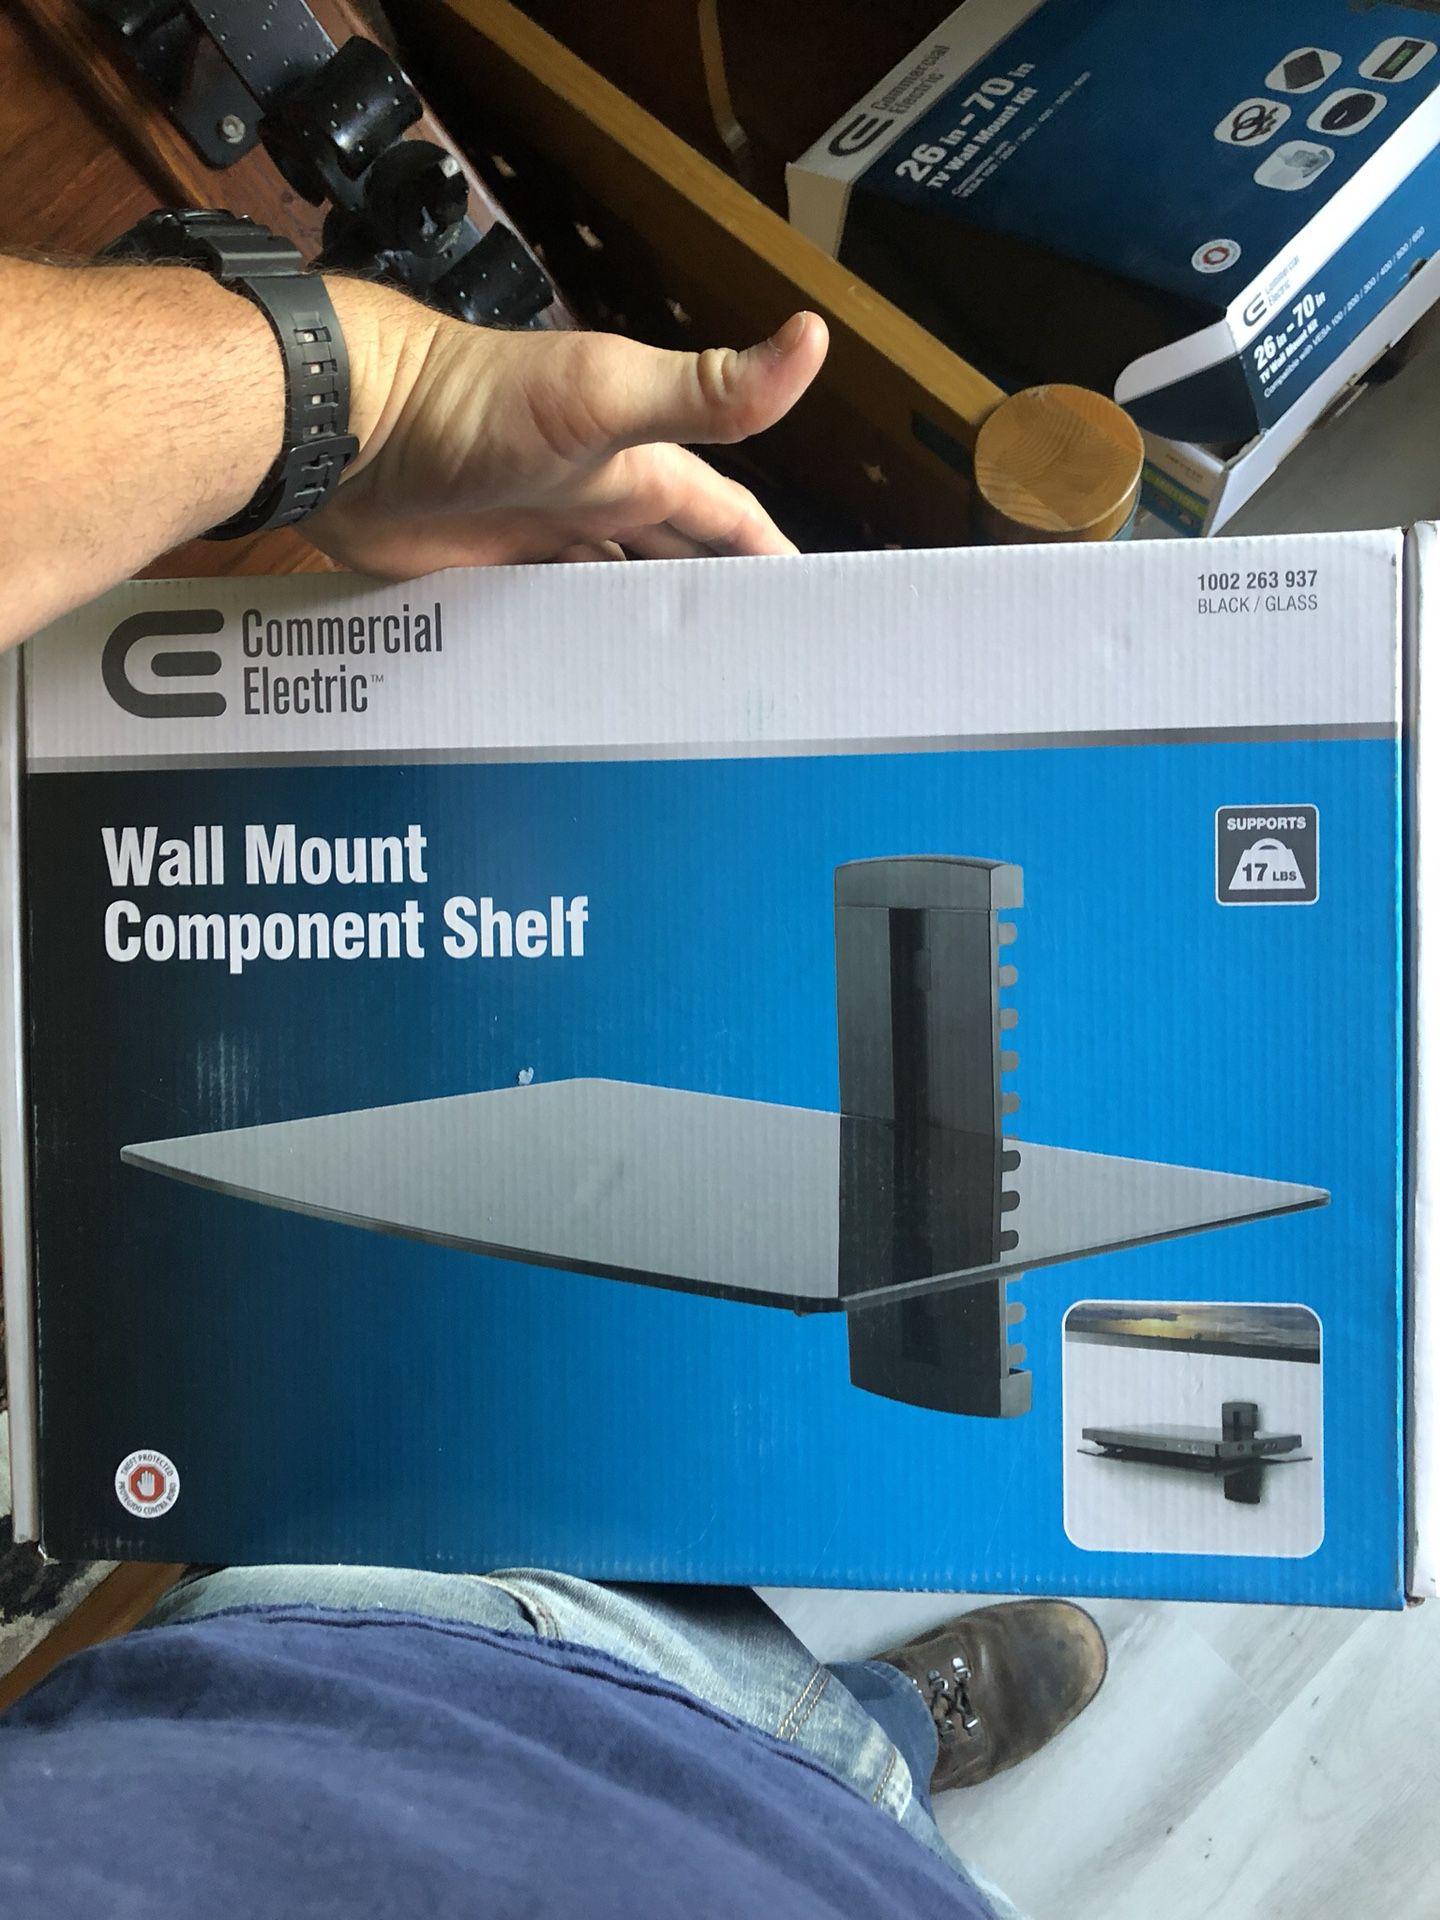 Component wall shelf